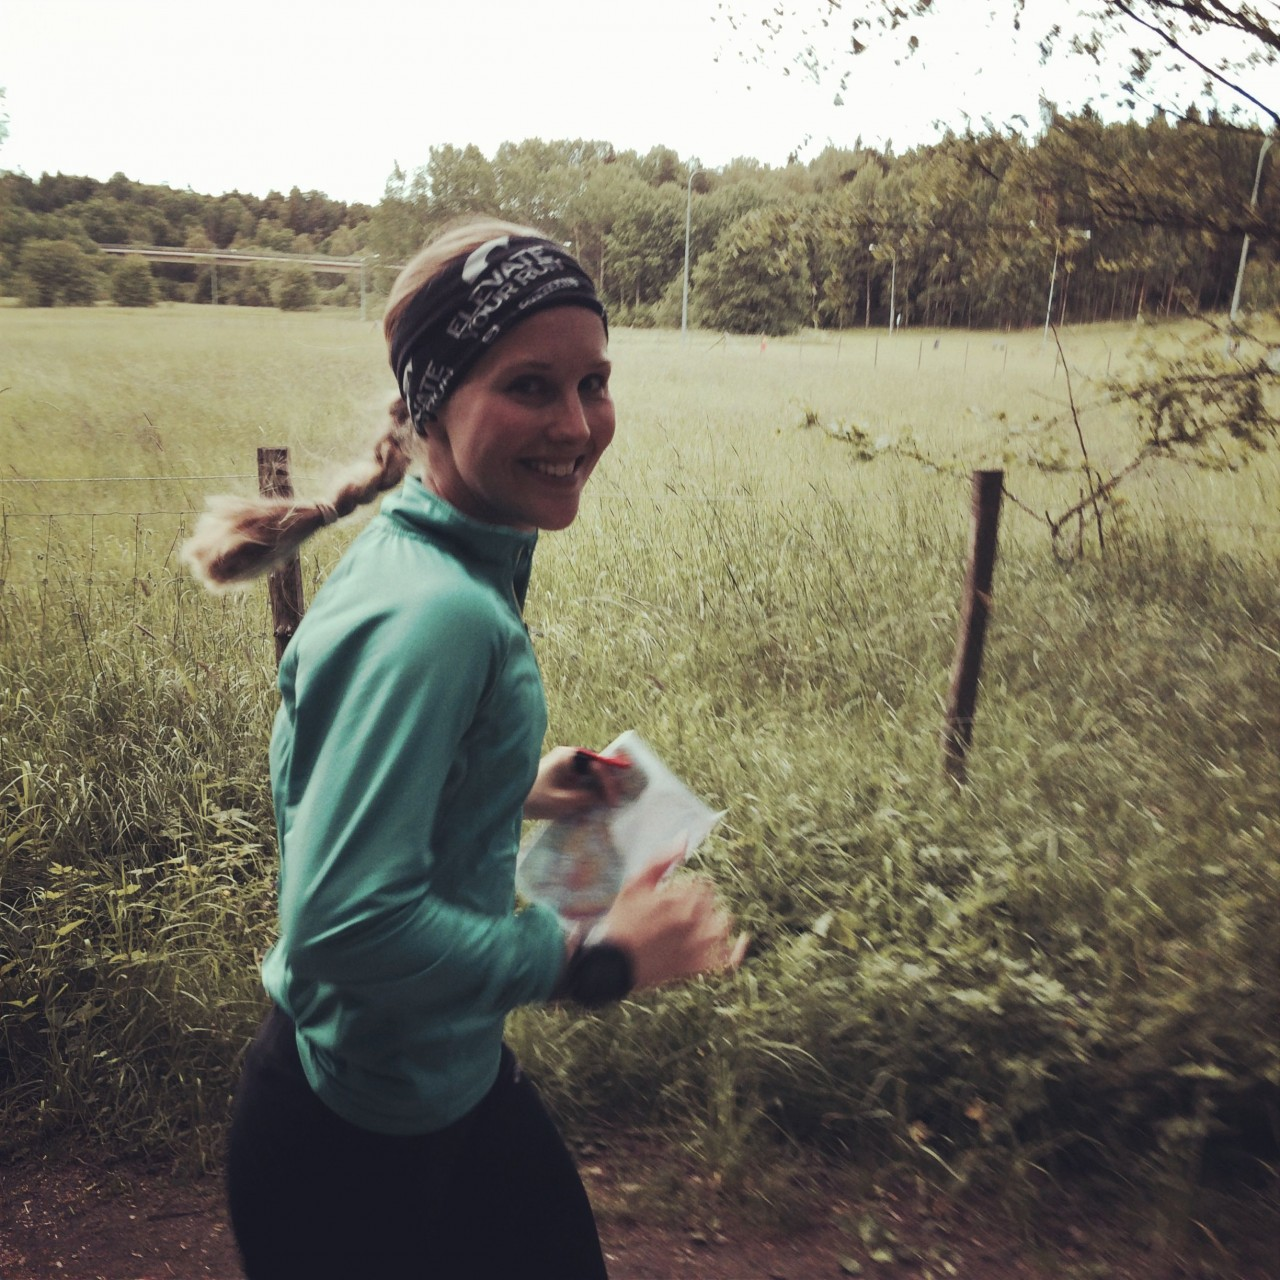 Jenny orientering